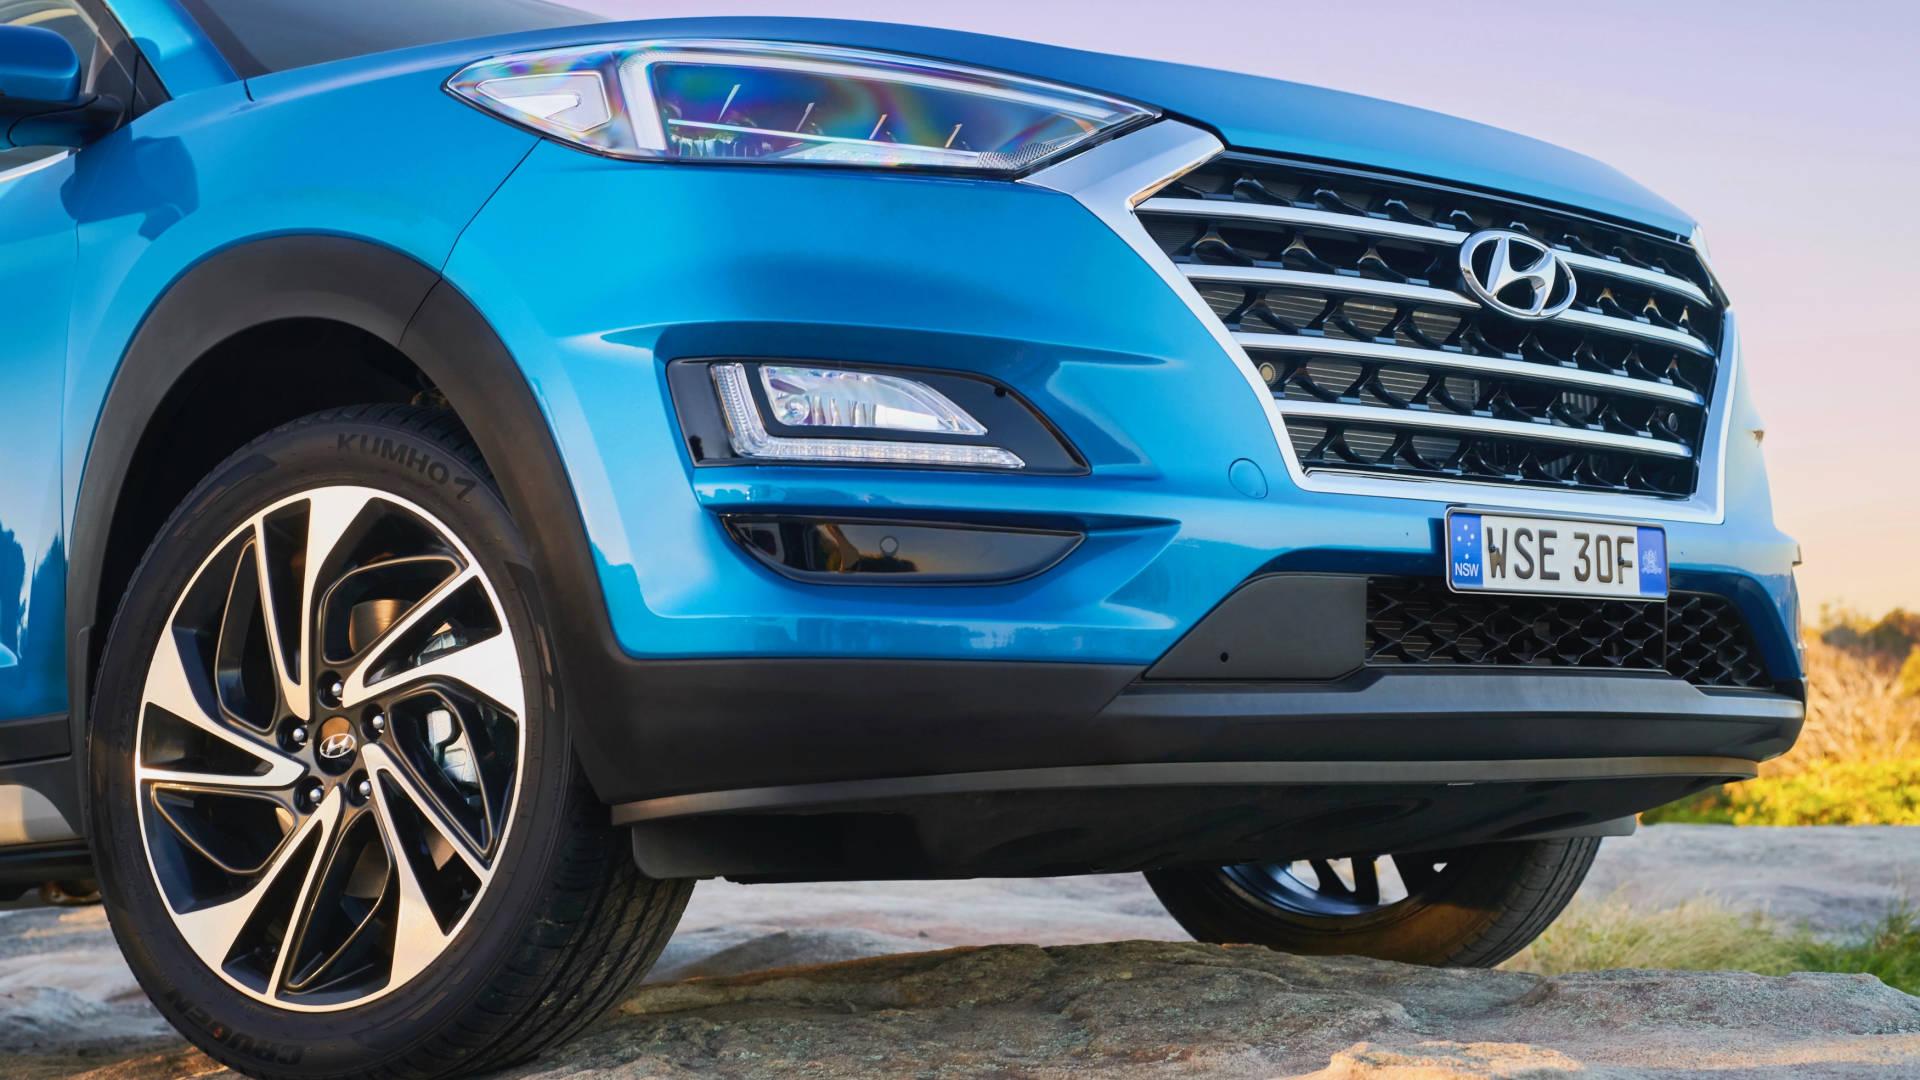 2019 Hyundai Tucson Highlander front detail